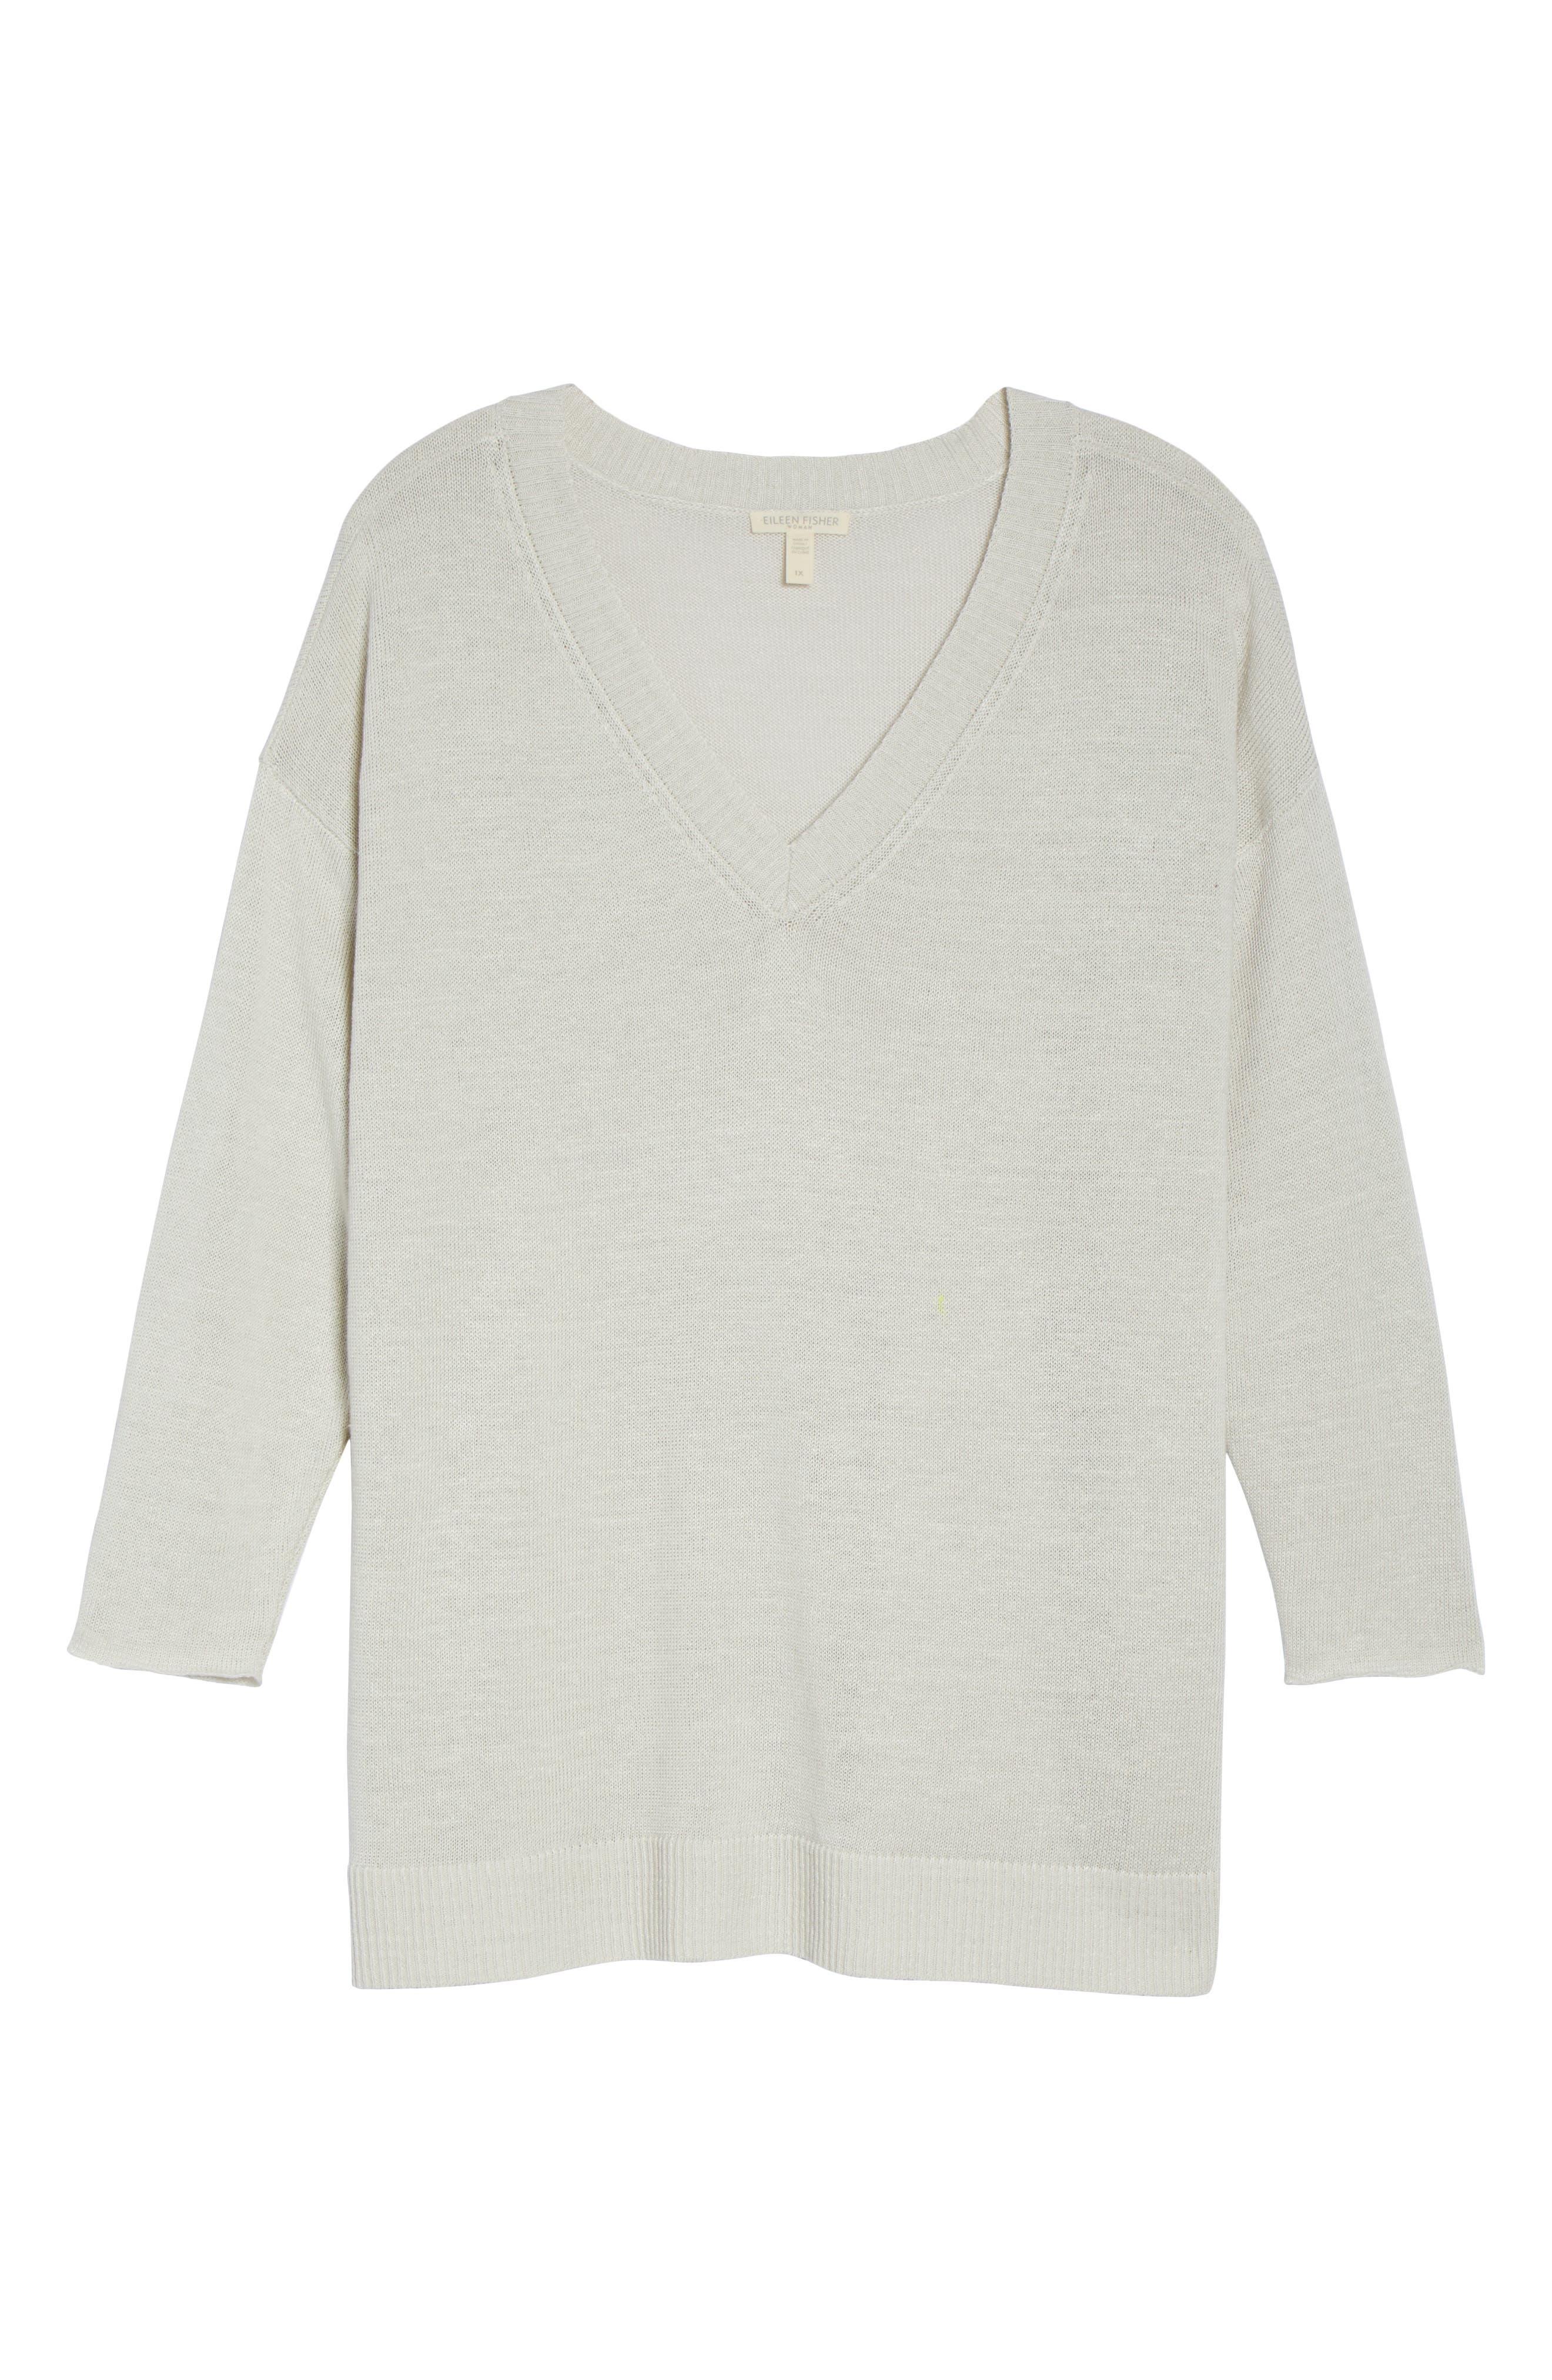 Organic Linen Sweater,                             Alternate thumbnail 6, color,                             Bone